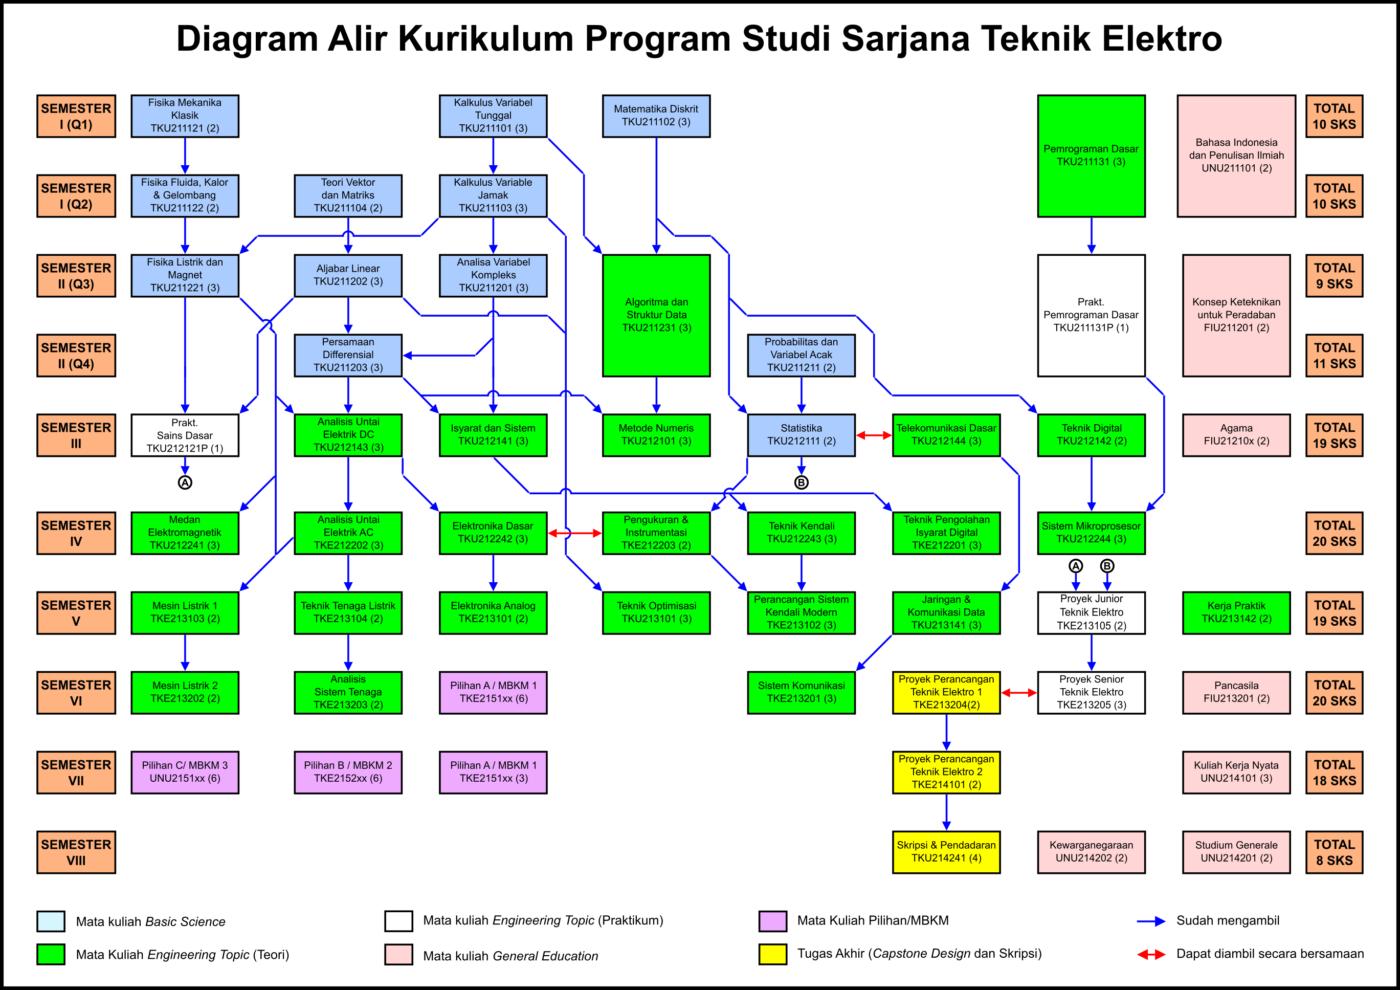 Diagram Alir Kurikulum Program Studi S-1 Teknik Elektro UGM